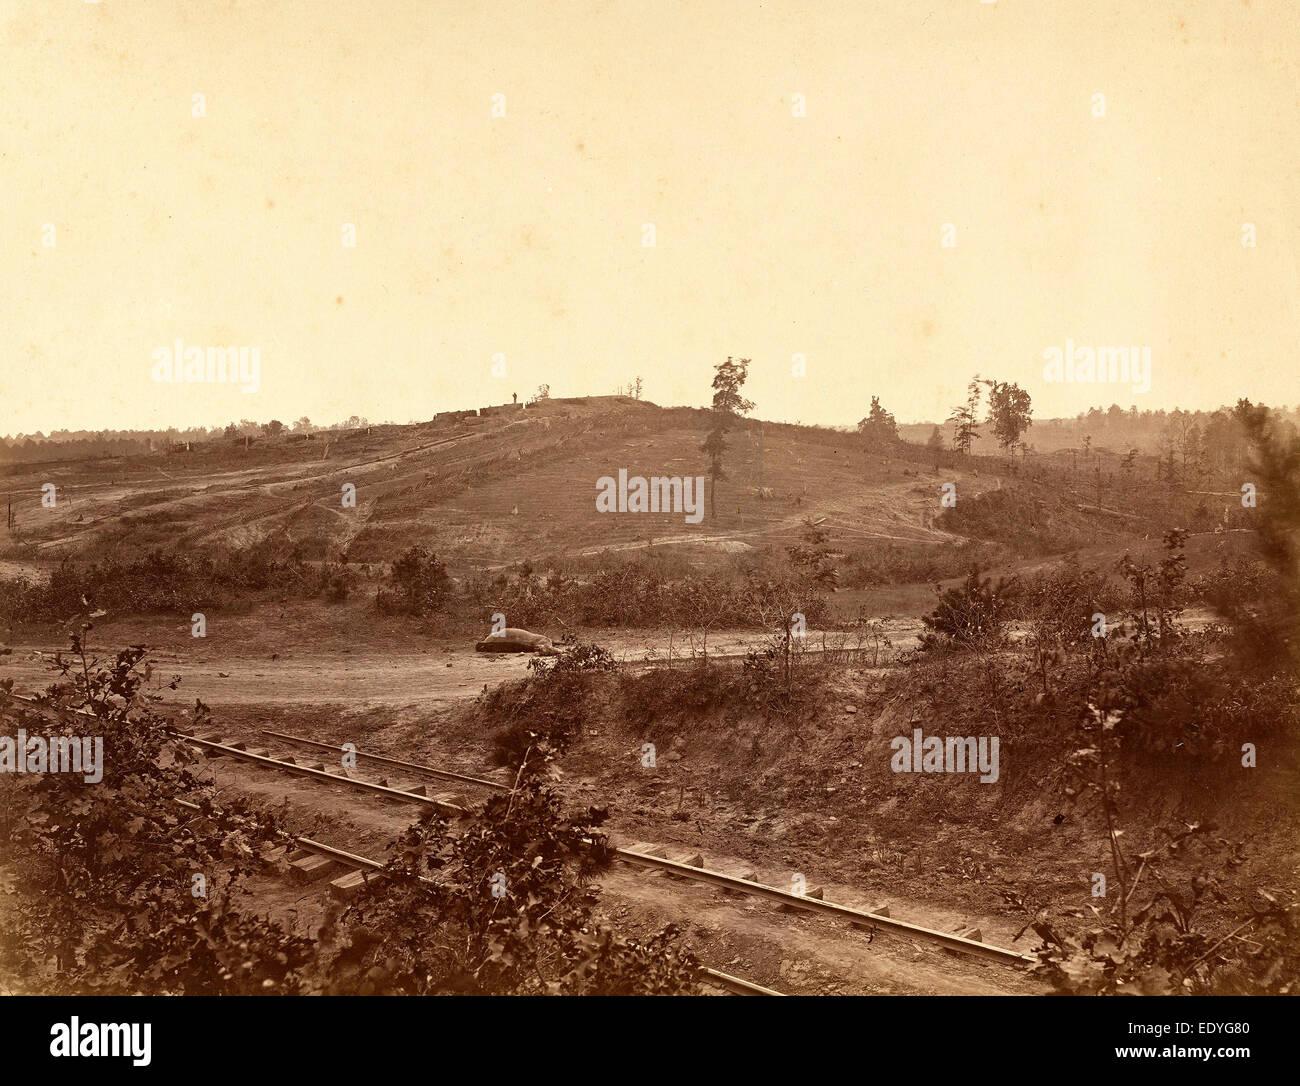 George N. Barnard, Battlefield in Atlanta, American, 1819 - 1902, 1864, albumen print from collodion negative - Stock Image